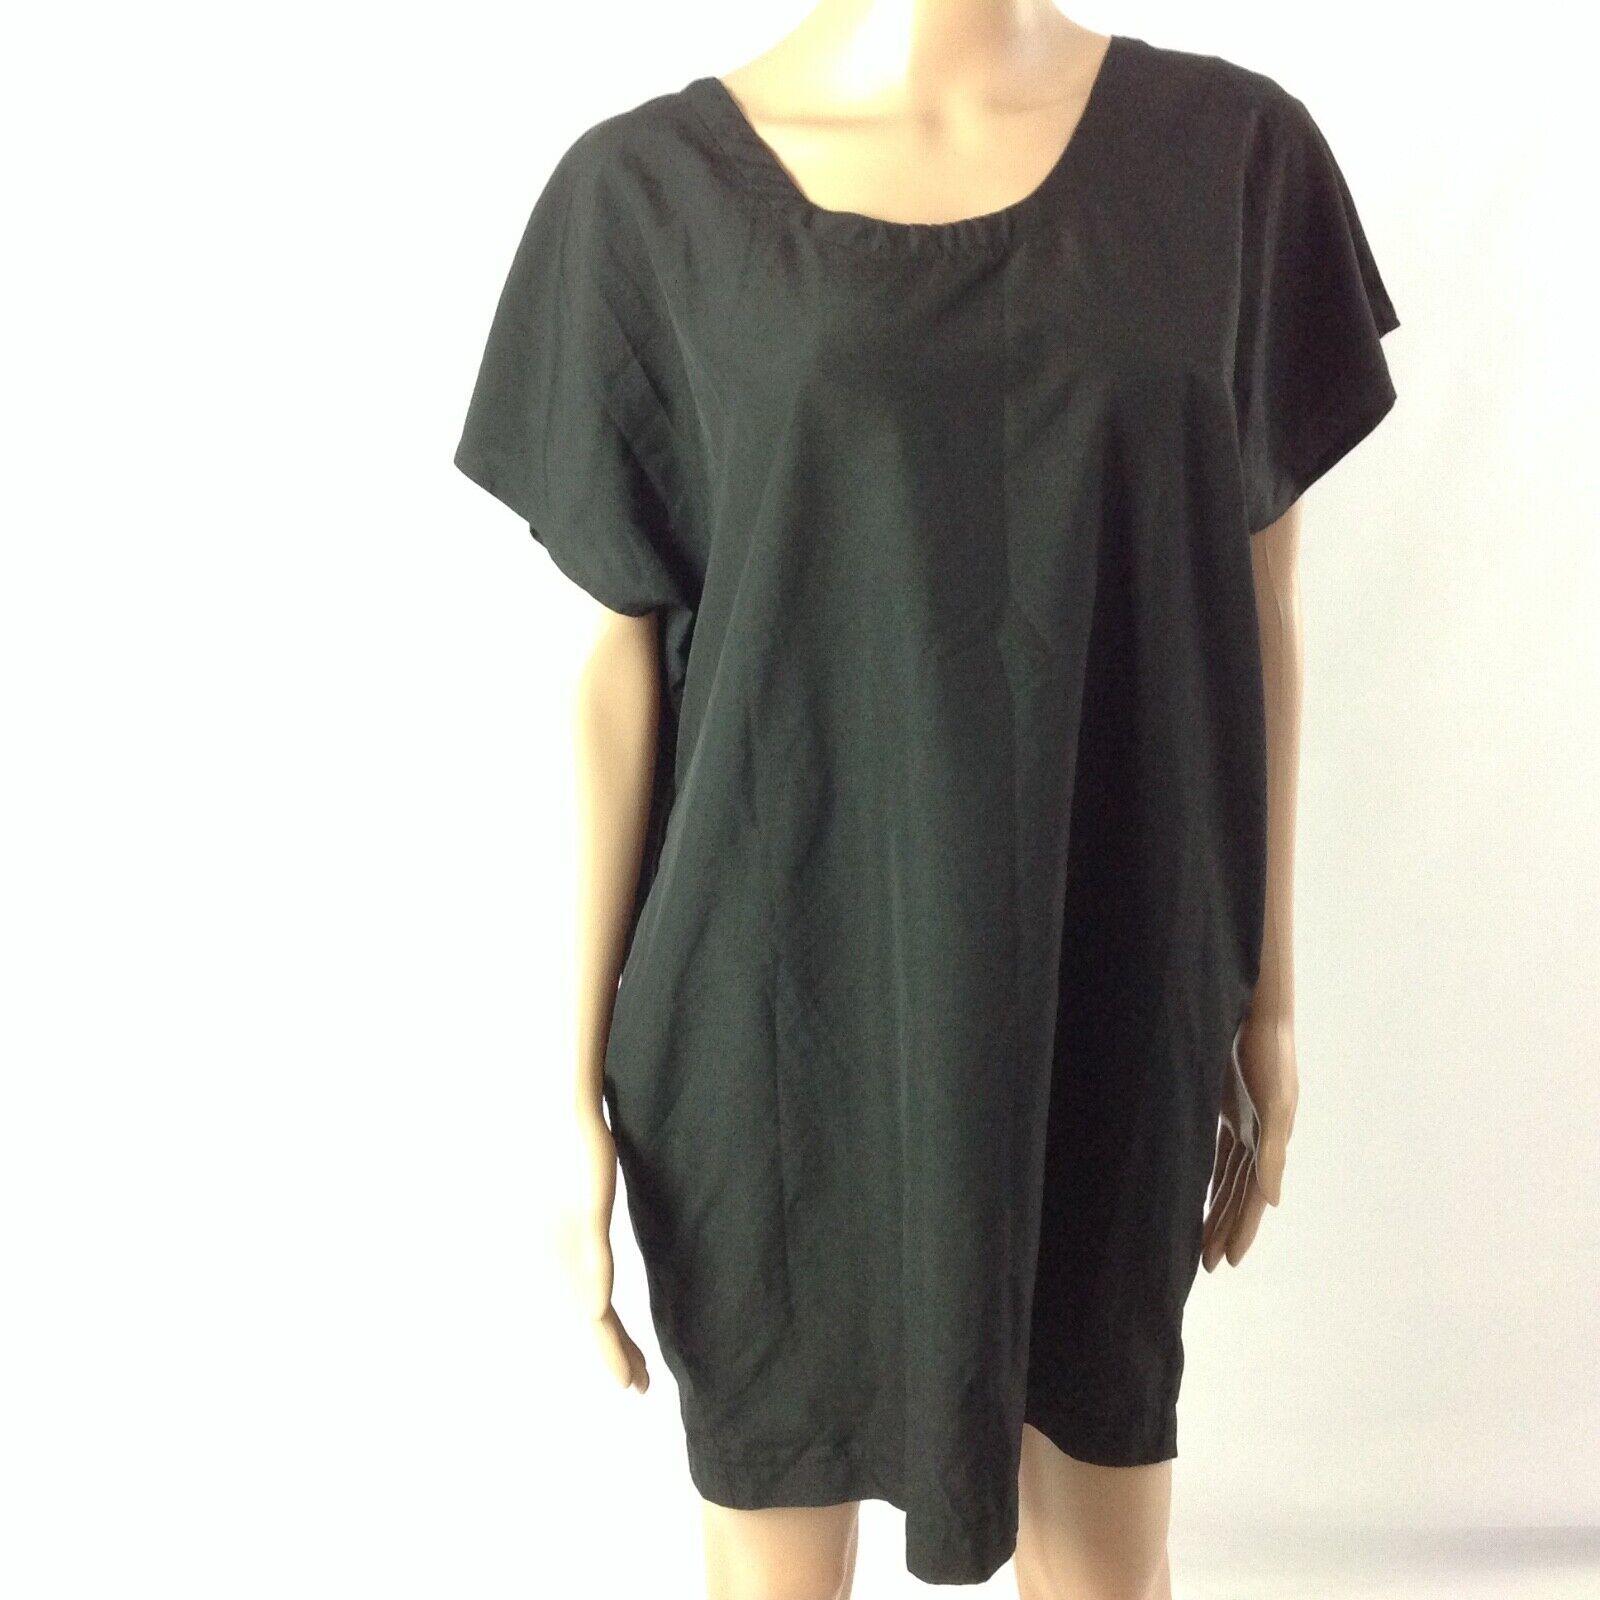 Vince damen Silk Tunic Top Größe S M  schwarz Solid Dolman Sleeve Shortsleeve